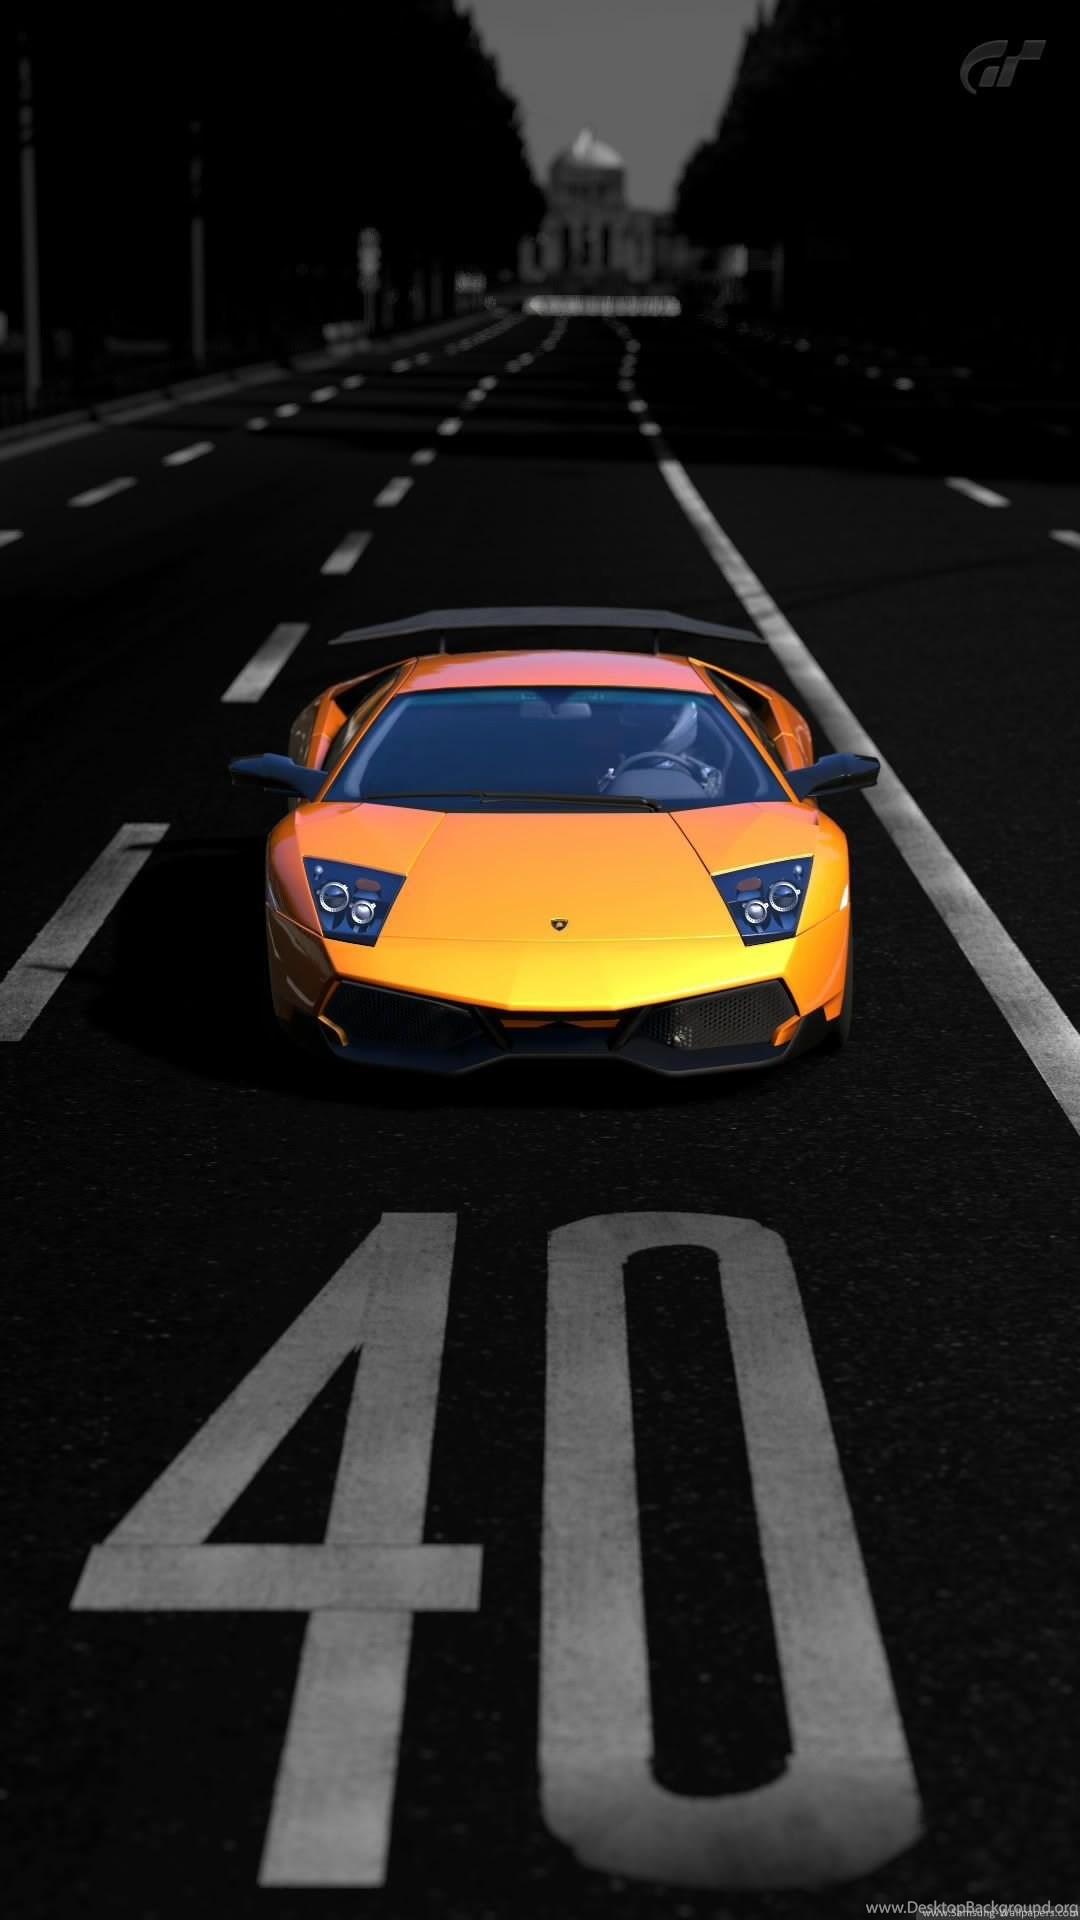 Galaxy S4 Hd Lamborghini Desktop 1080x1920 Samsung Desktop